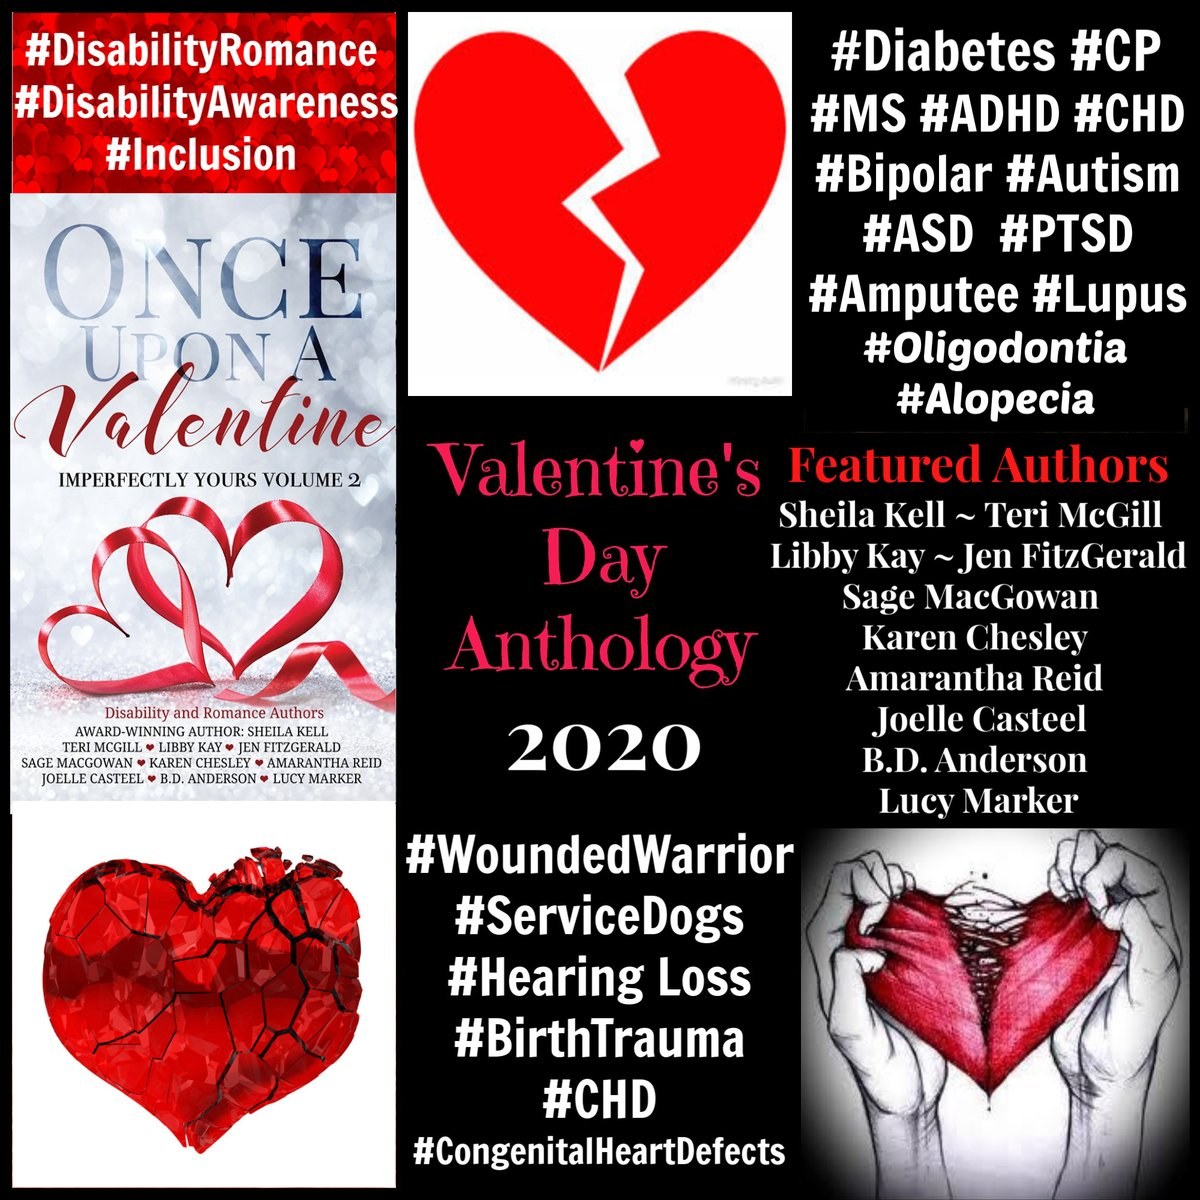 💘🤟🏼♿️💘 #ValentinesDay #KindleUnlimited🆓#KU #Anthology #Romance #ContemporaryRomance #NewAdult #DisabledCharacters #DisabilityRomance #Disabilities #Inclusion #Deaf🤟🏼 #MS #PTSD #WoundedWarrior #Amputee #ServiceDog #Lupus #Diabetes #CHD💔 #CHDwarrior💔#CP https://t.co/htJ8pB1c5O https://t.co/riZxH9cODM